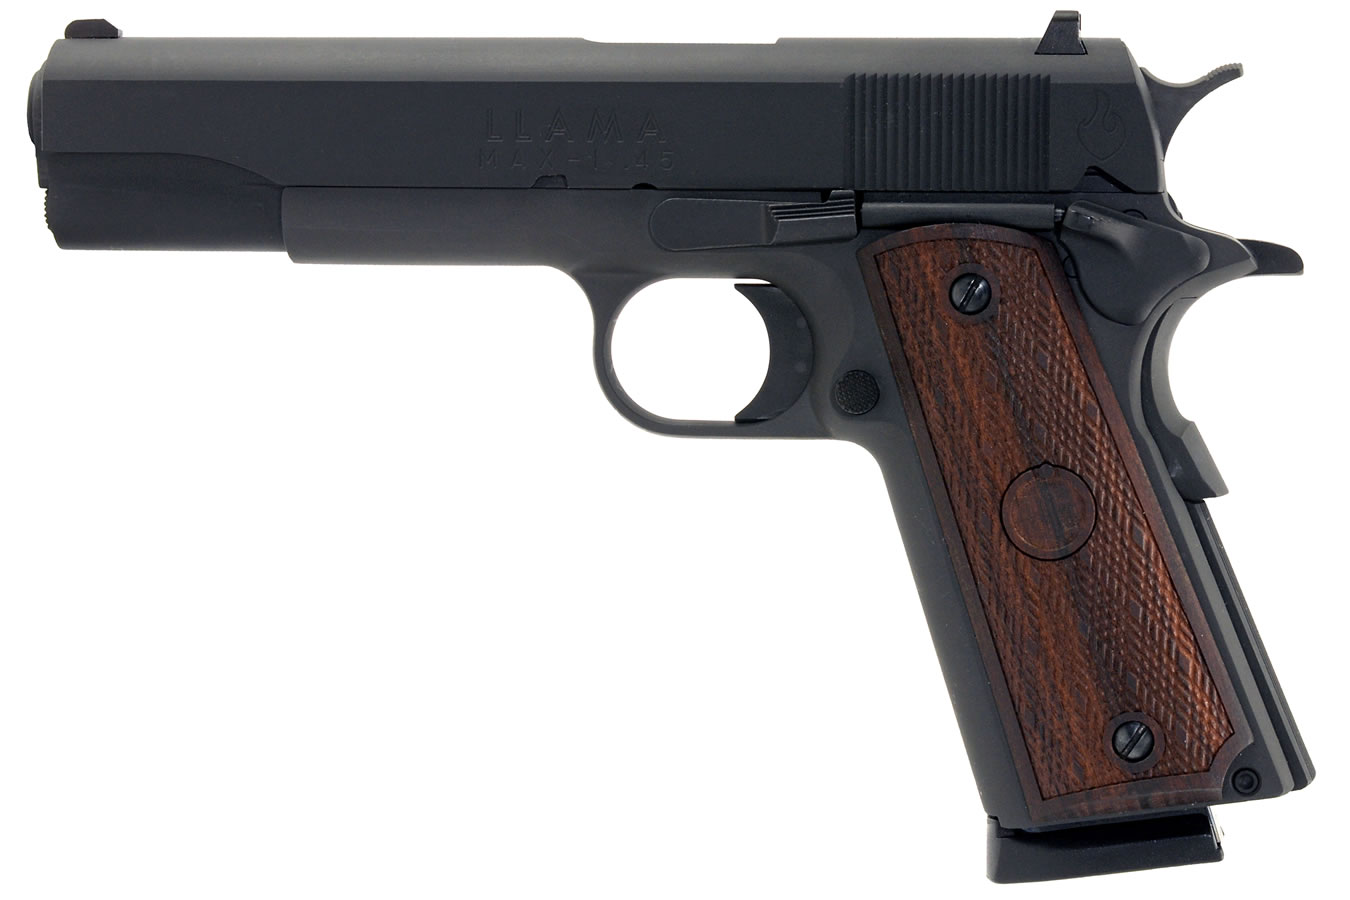 llama max i 1911 45 acp centerfire pistol sportsman s outdoor rh sportsmansoutdoorsuperstore com 1911 Llama 45 Cal Magazine Llama 45 Extra